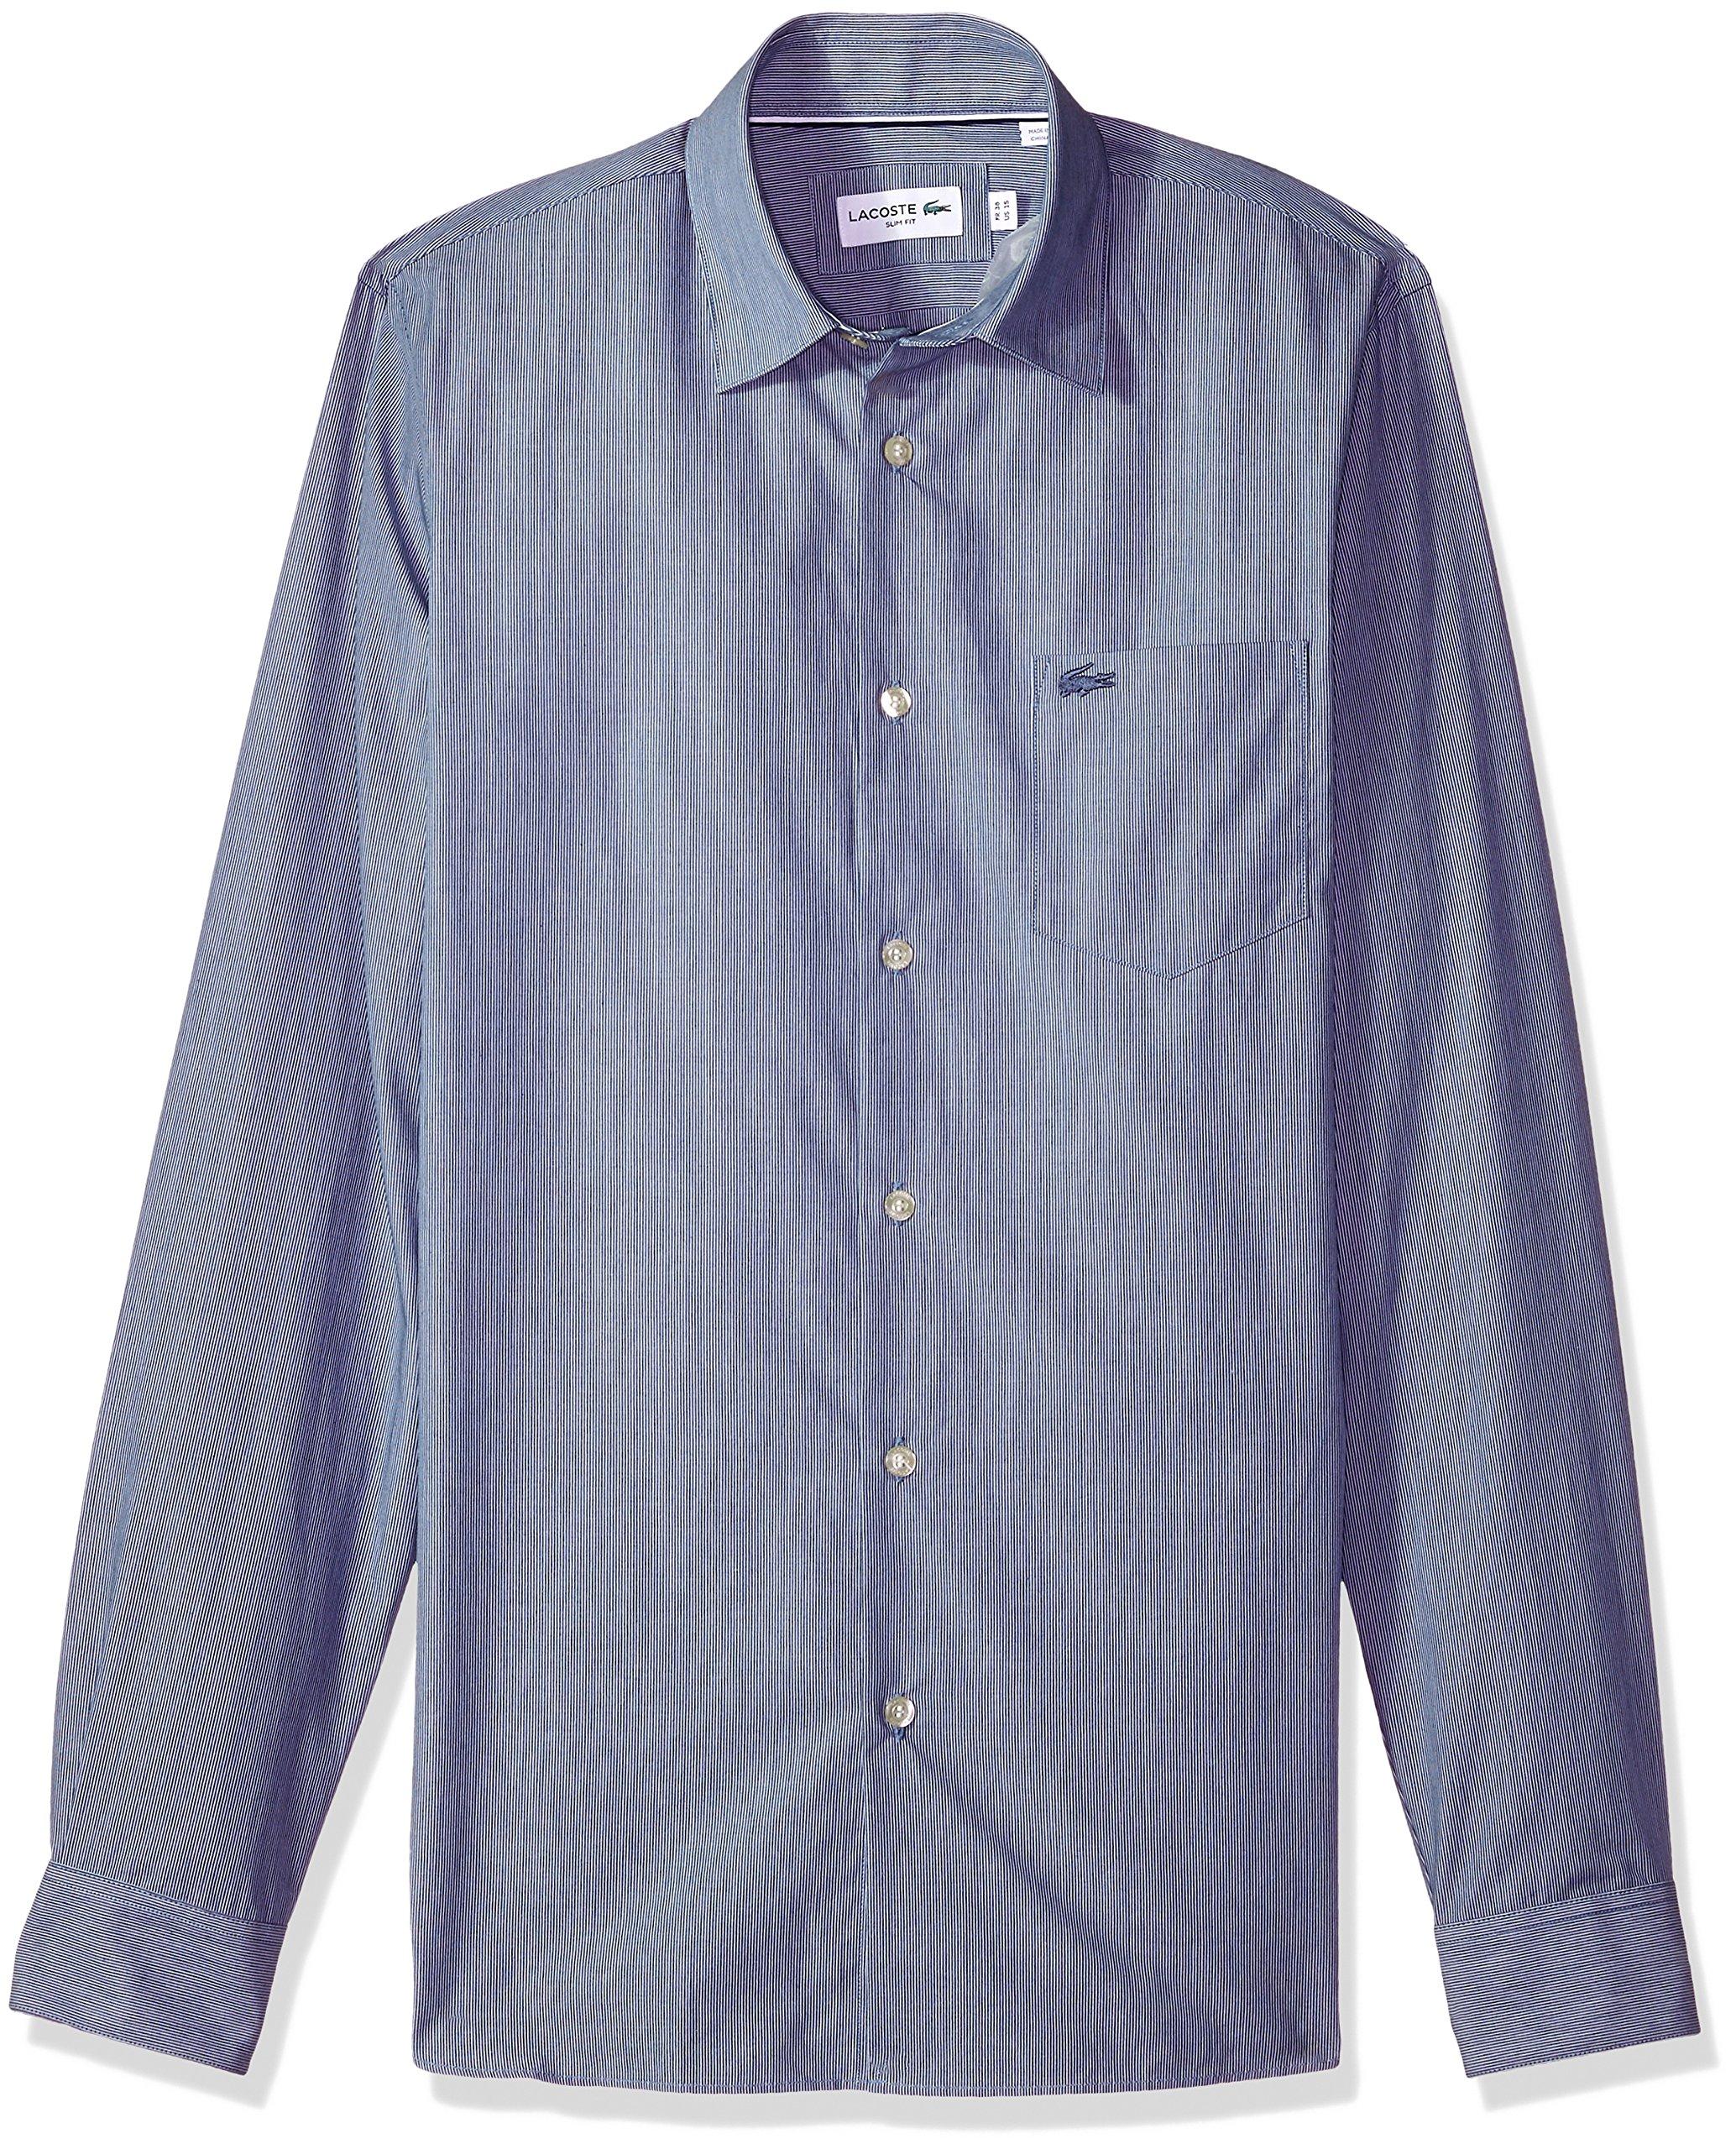 Lacoste Men's Long Sleeve Finely Striped-Poplin Slim Woven Shirt, Ch4989, Marino/White, 40